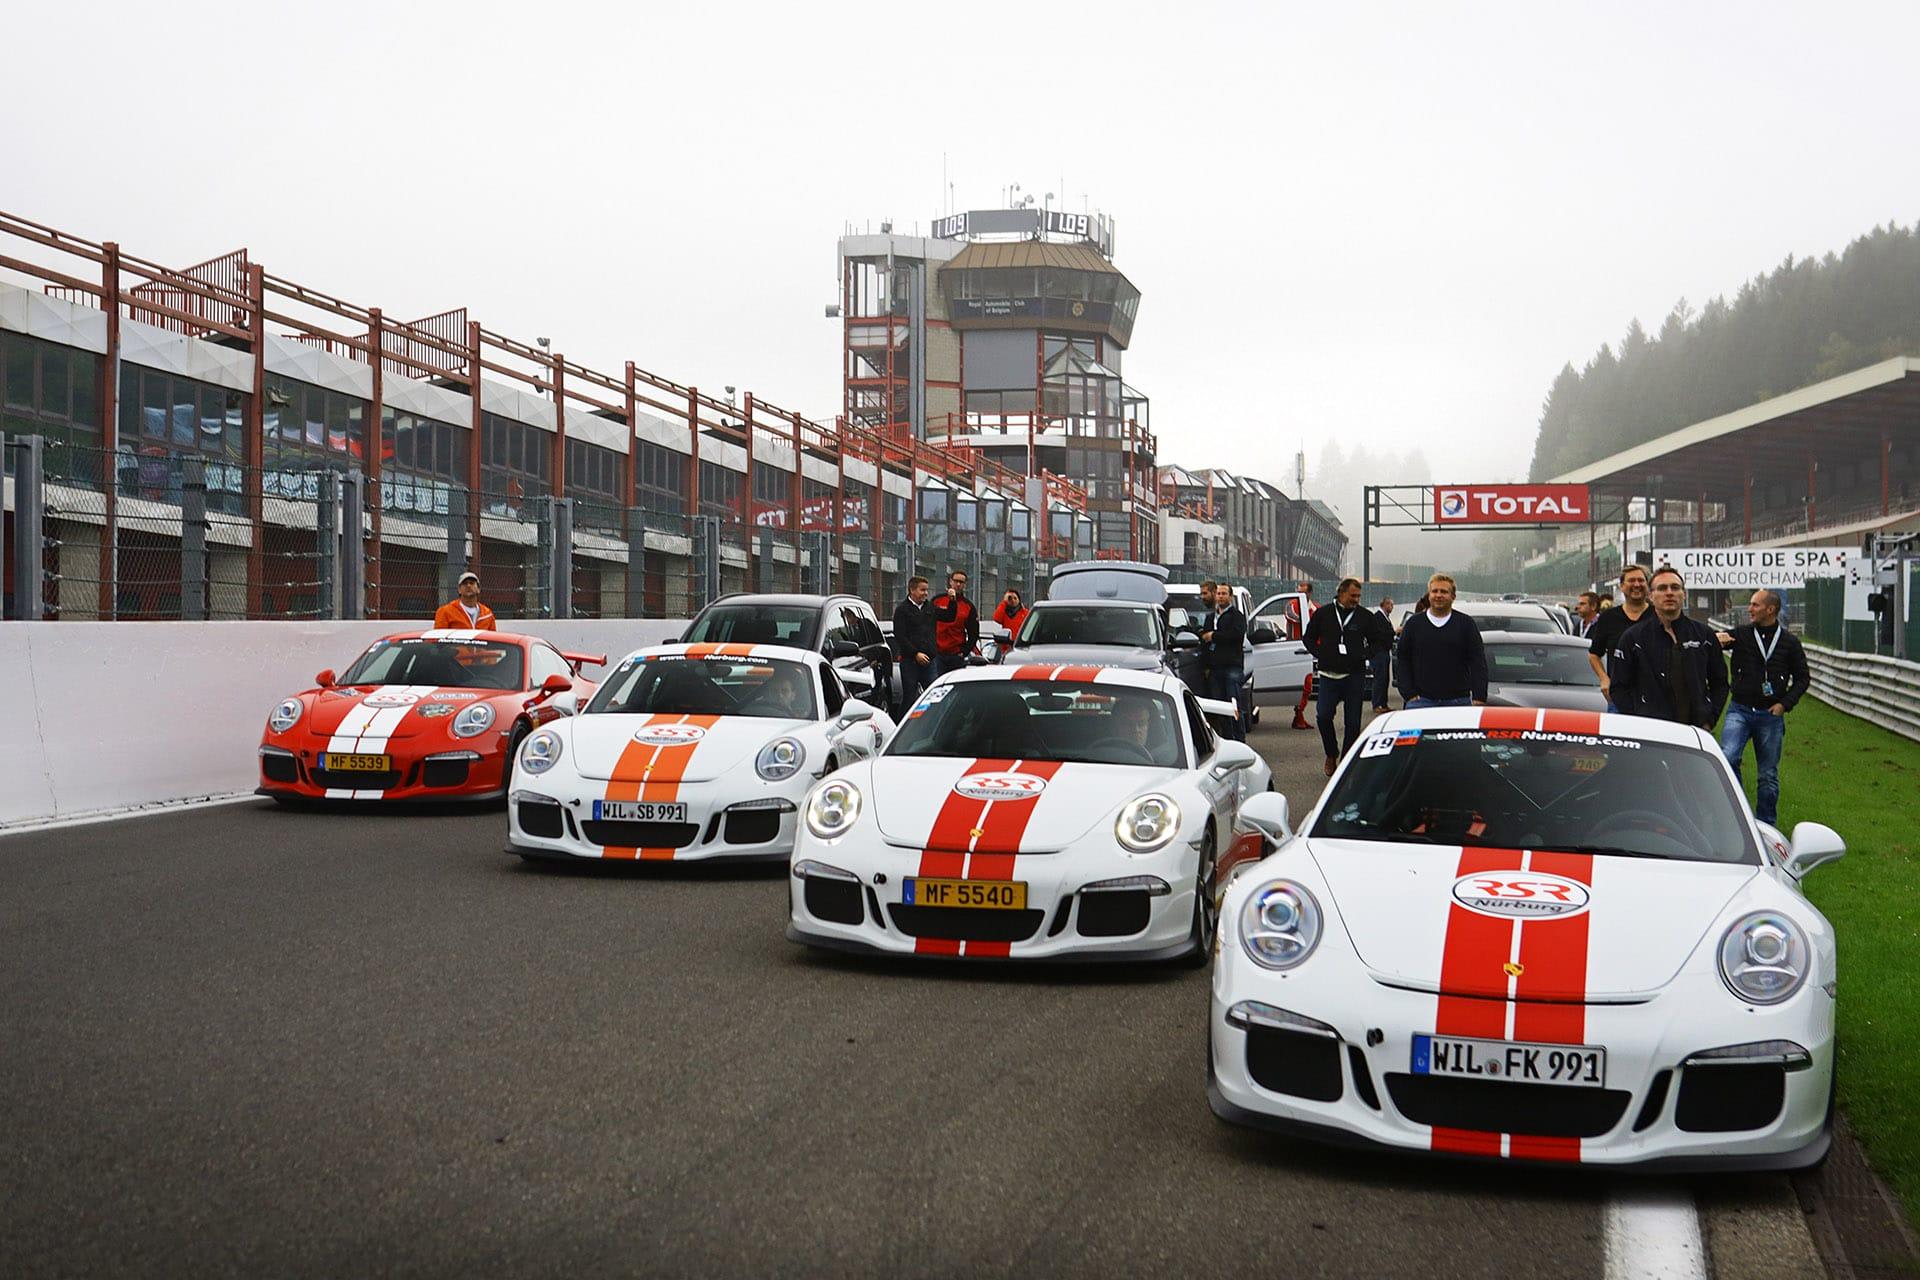 Trackdays auf der Rennstrecke Spa-Francorchamps – the thrill of the ride